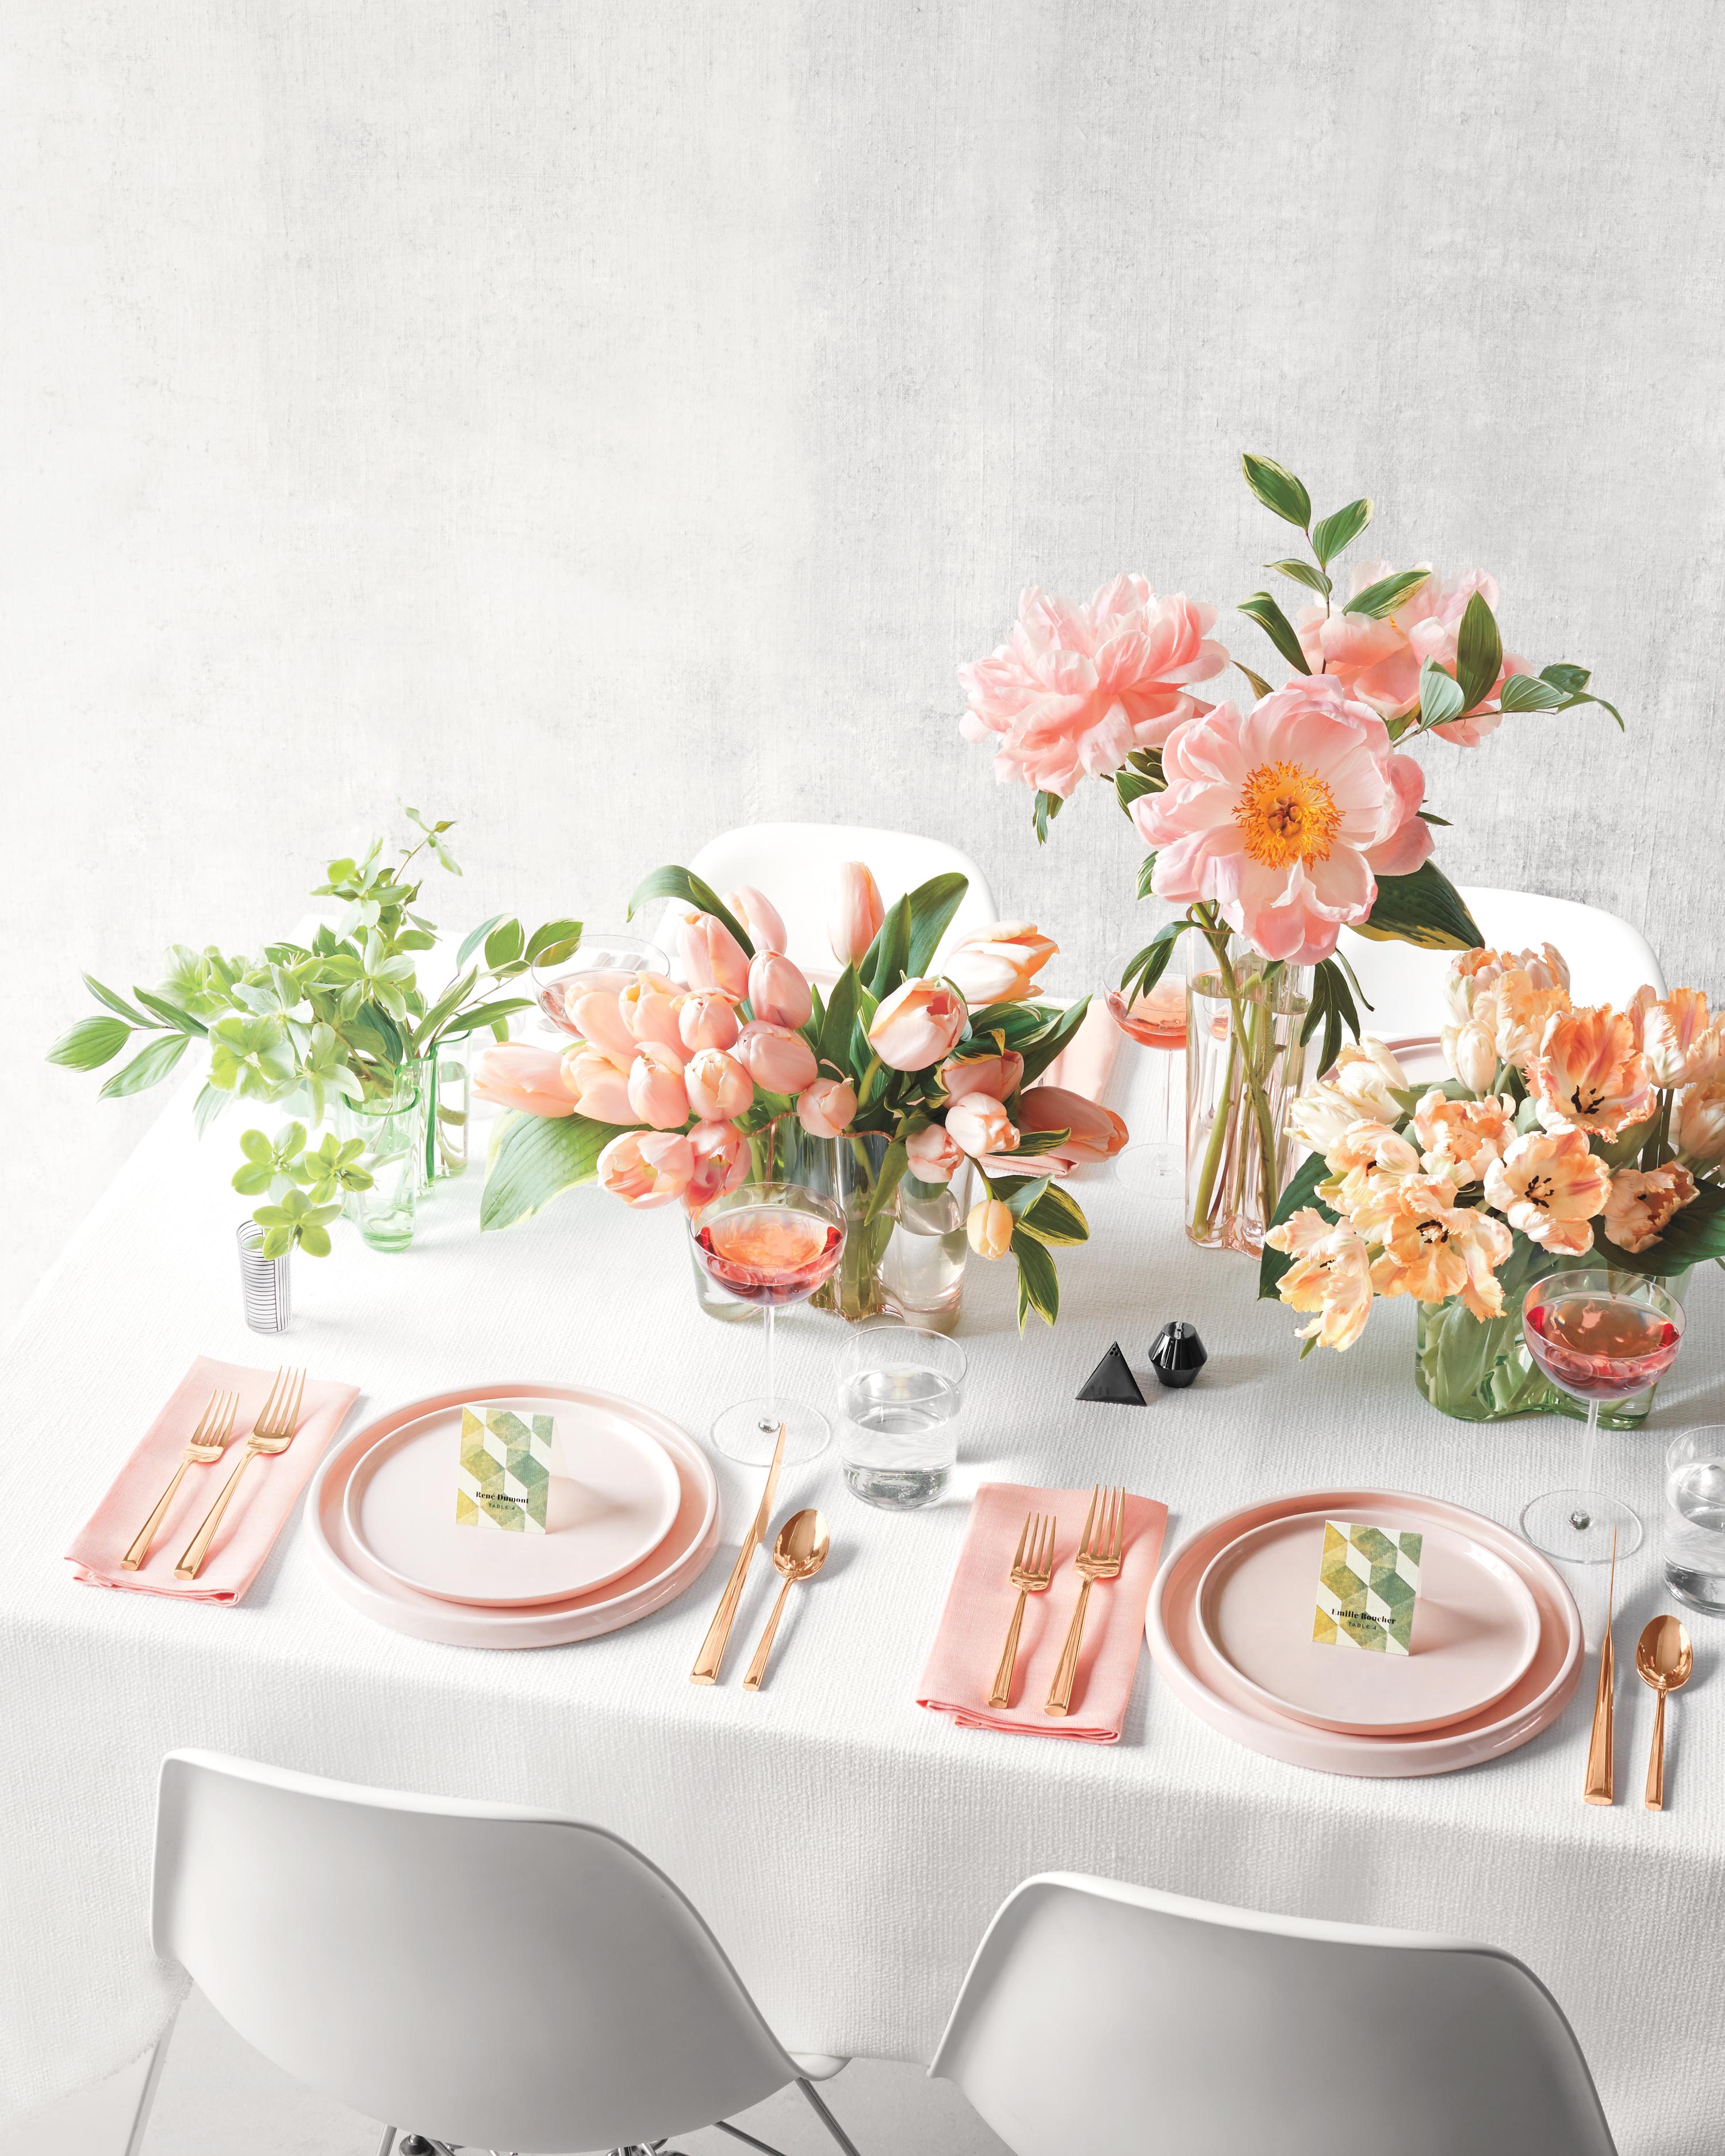 table-setting-633-d111274.jpg